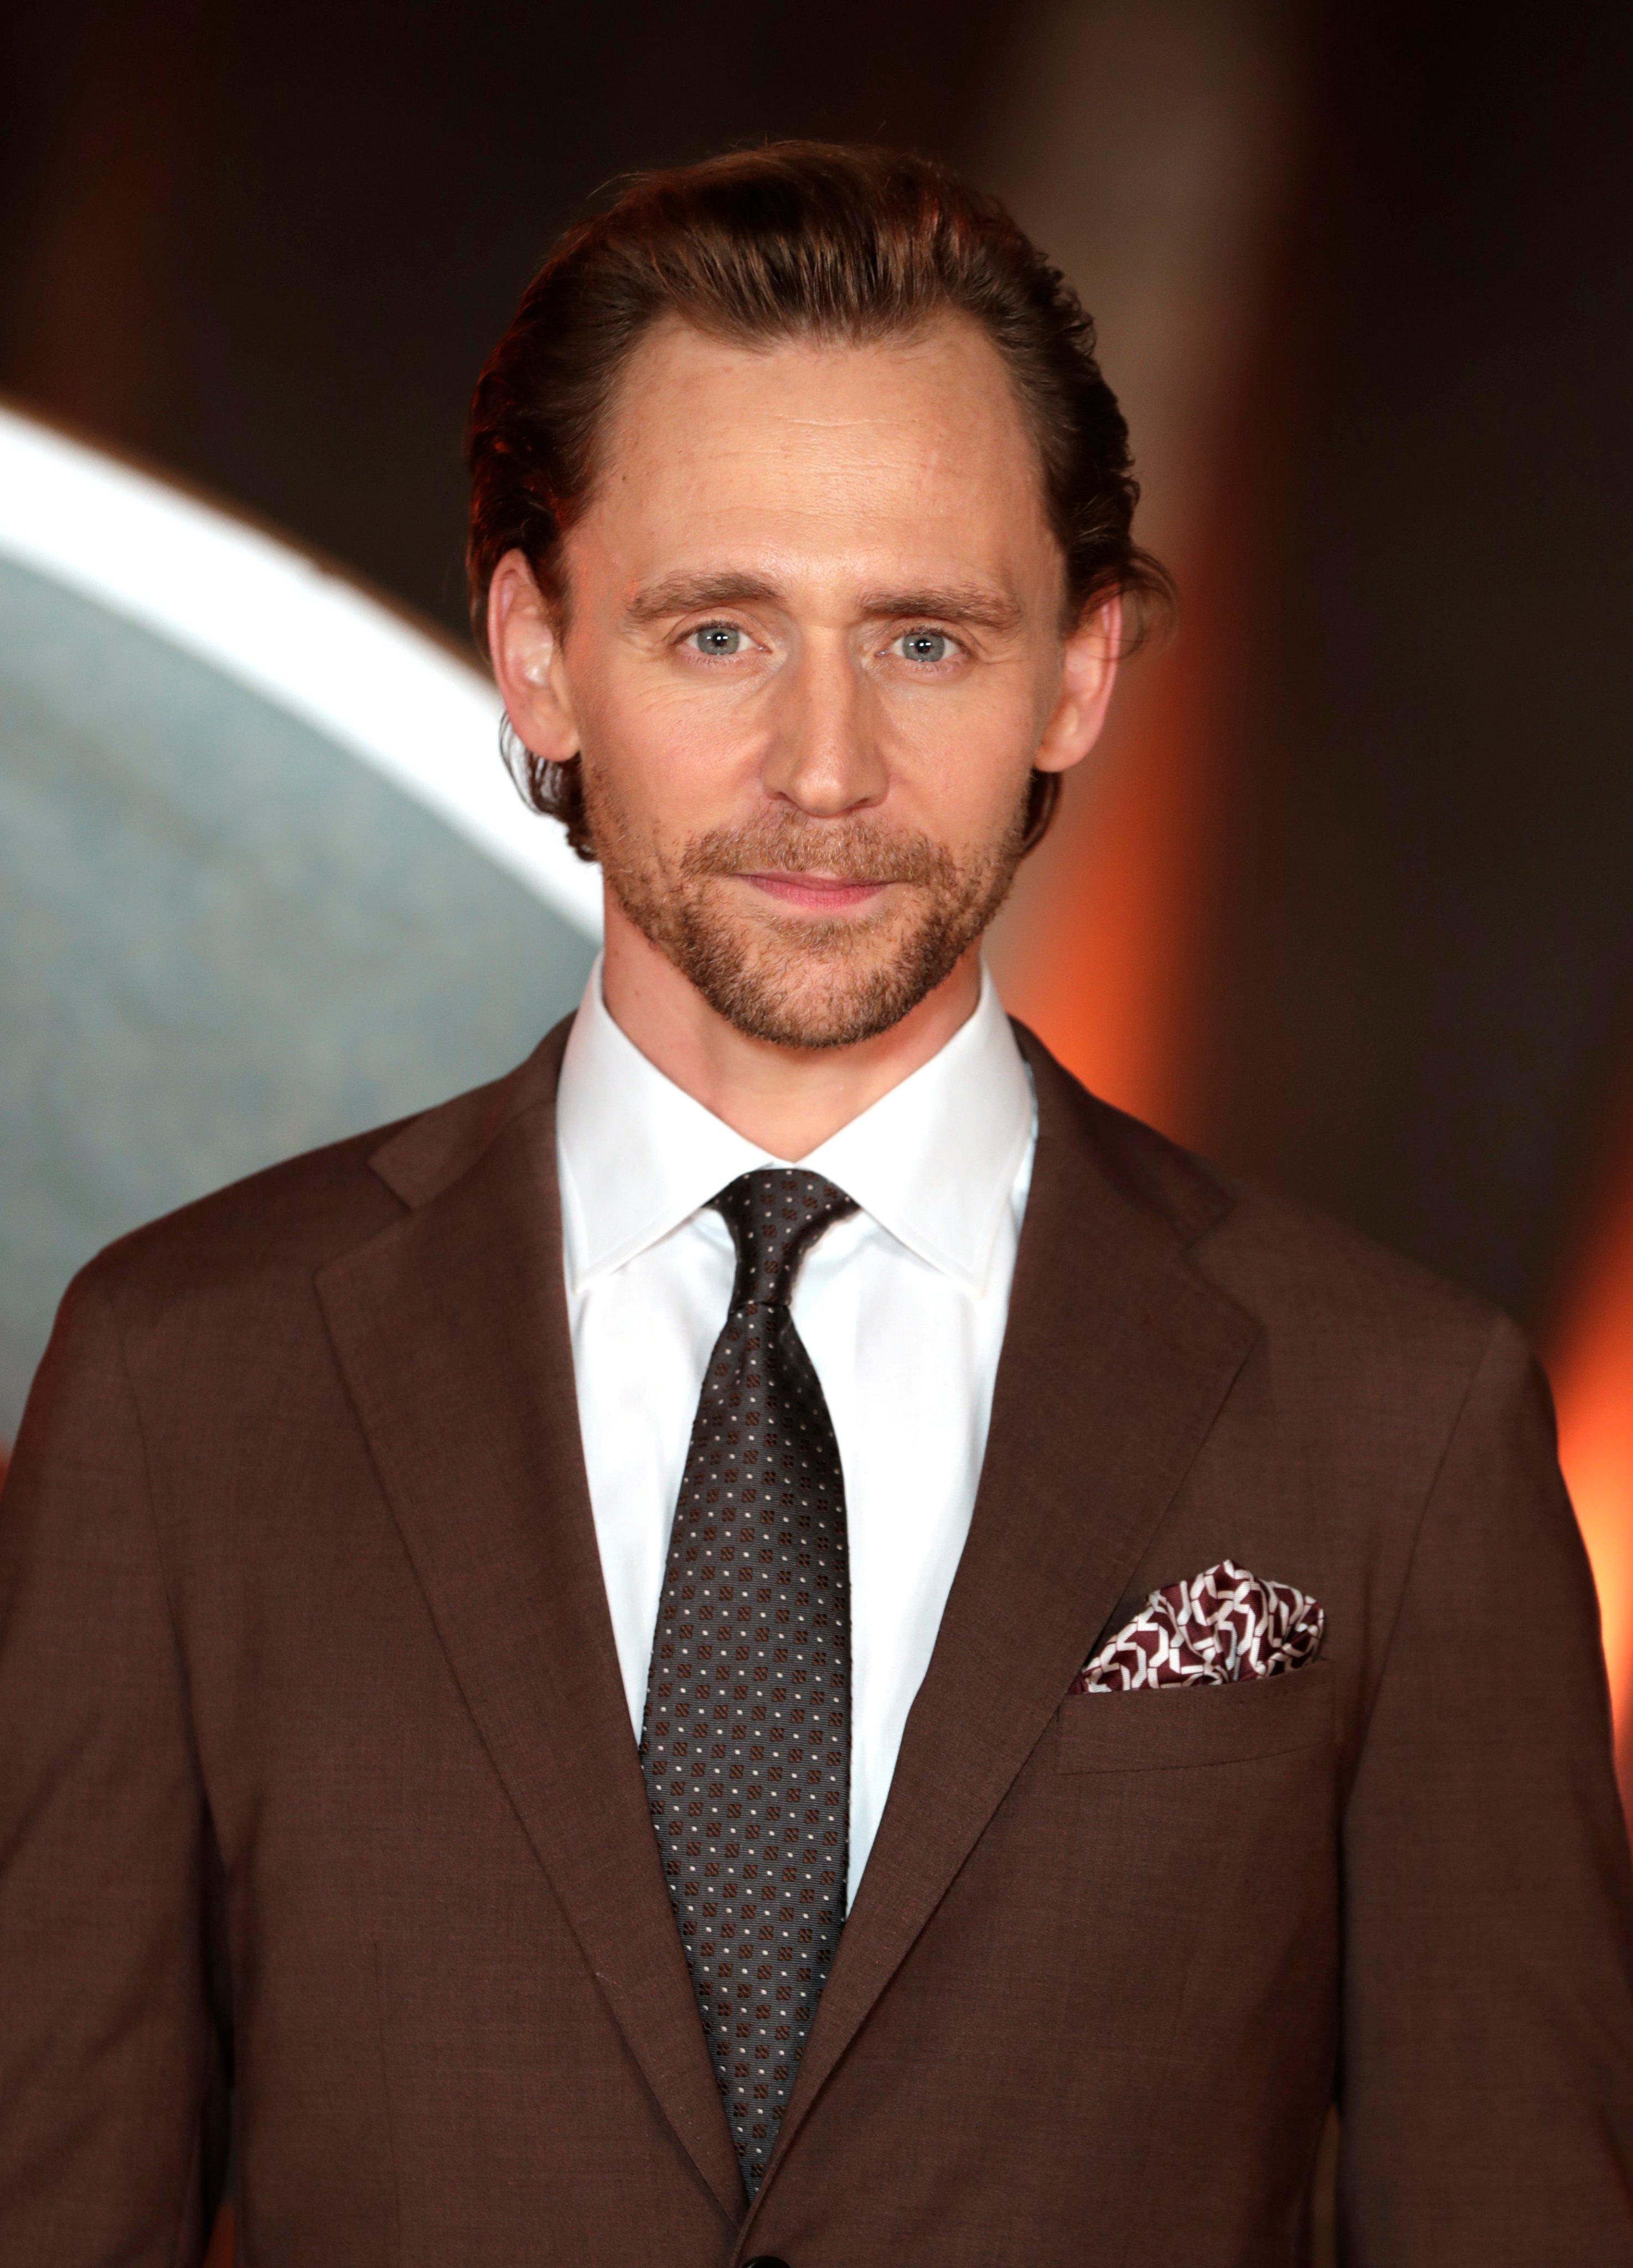 Файл:Tom Hiddleston.jpg